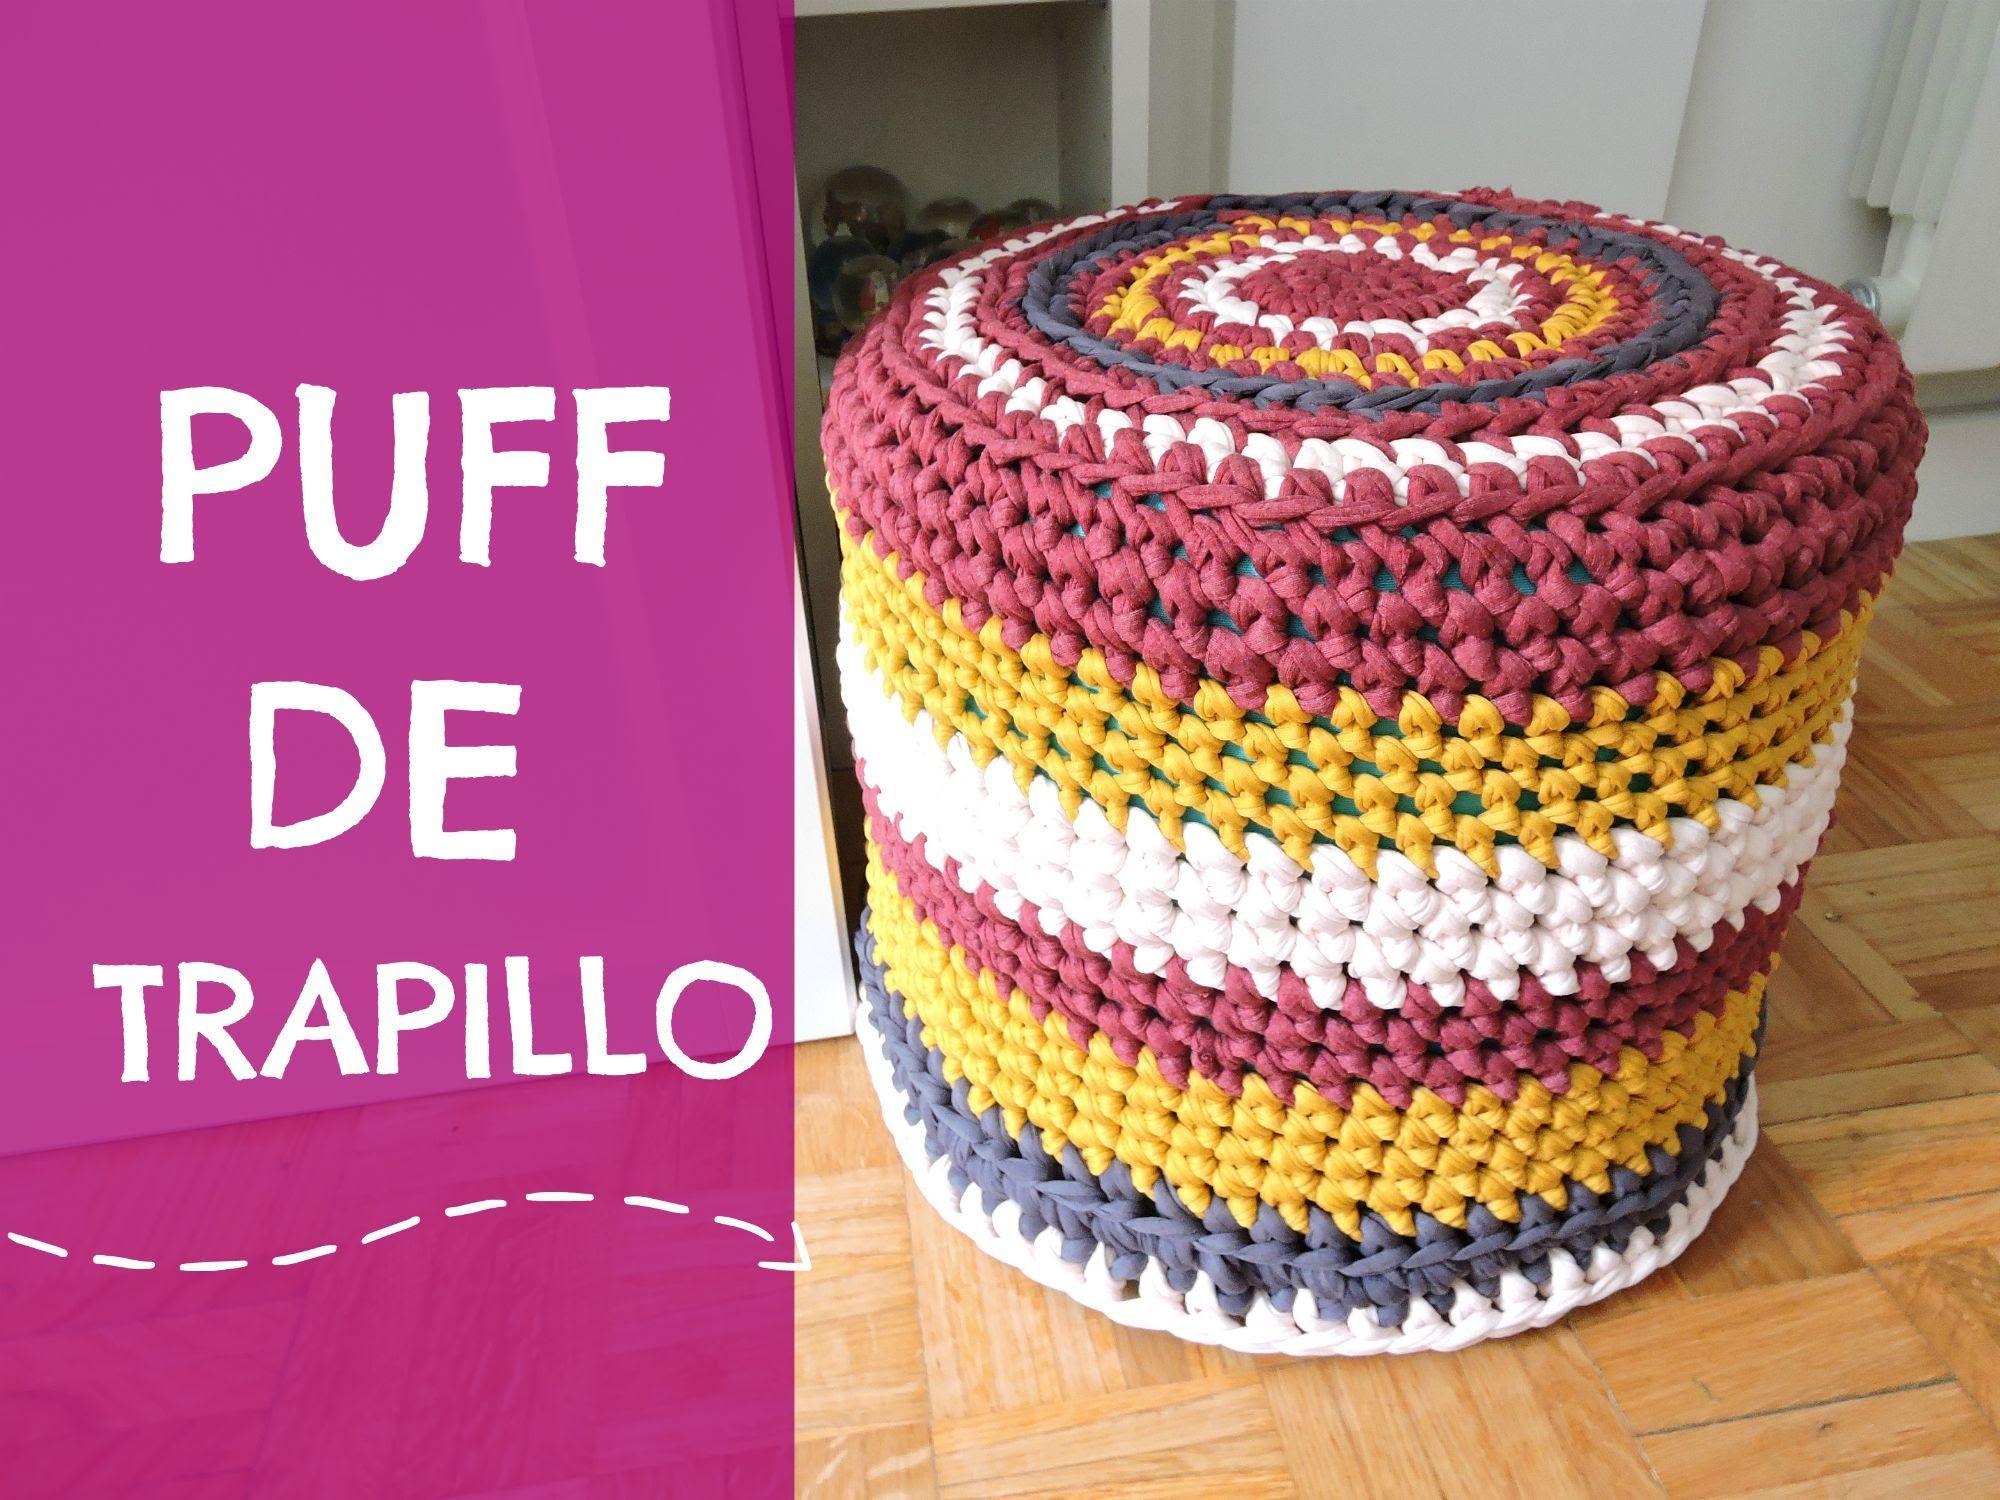 Puff de trapillo tutorial paso a paso | Denenecek Projeler | Pinterest